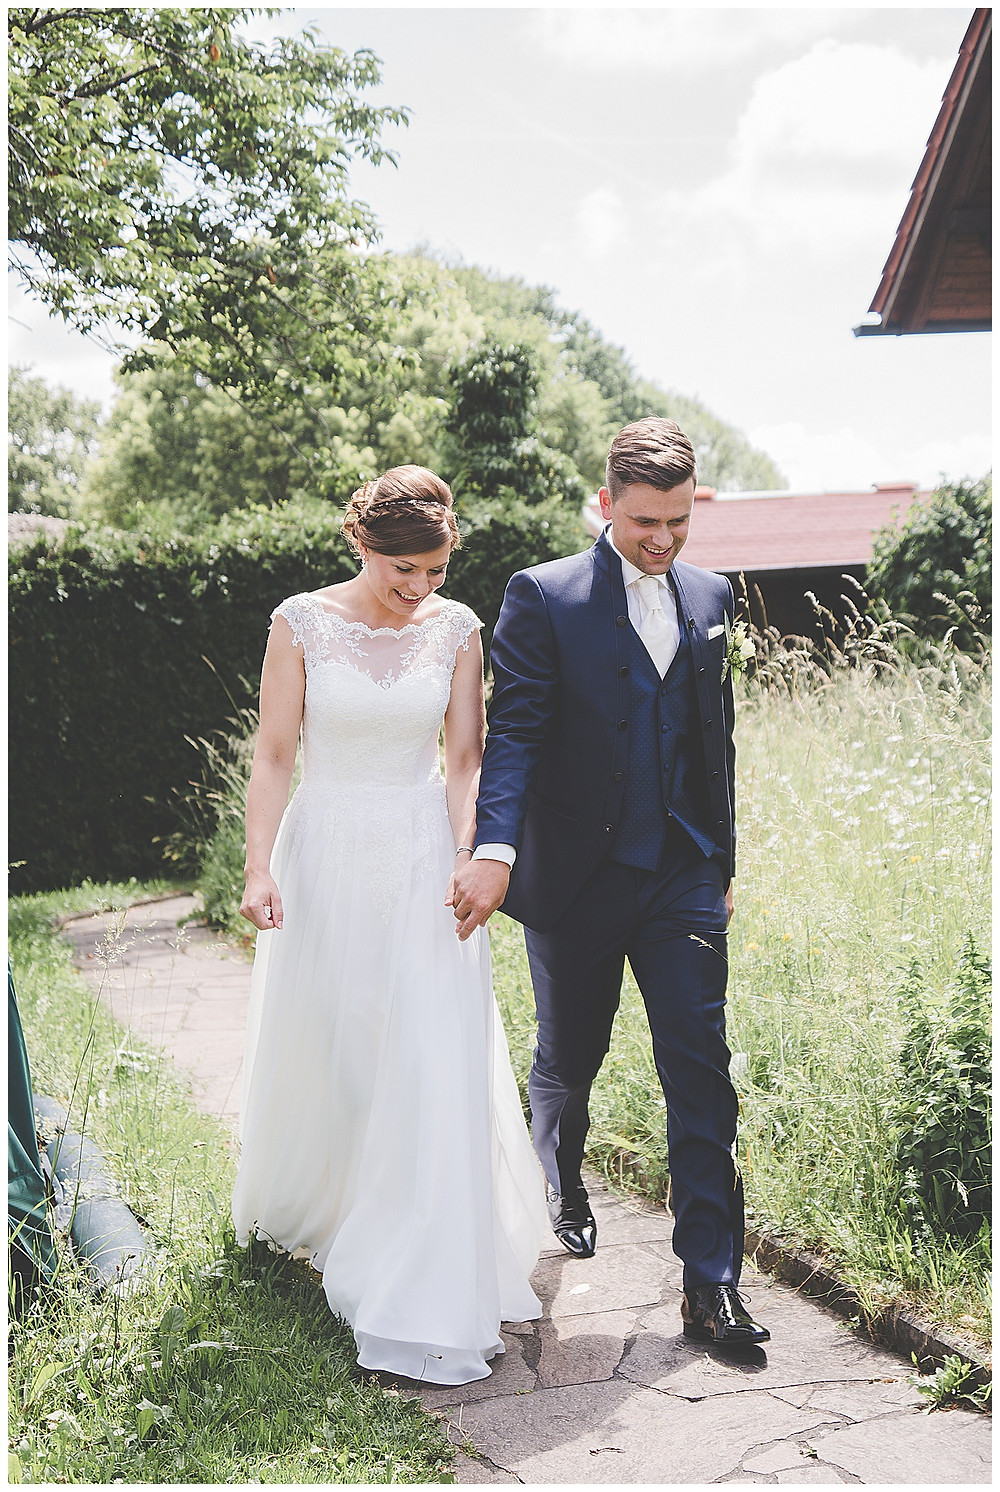 Brautpaarfotos Peiting